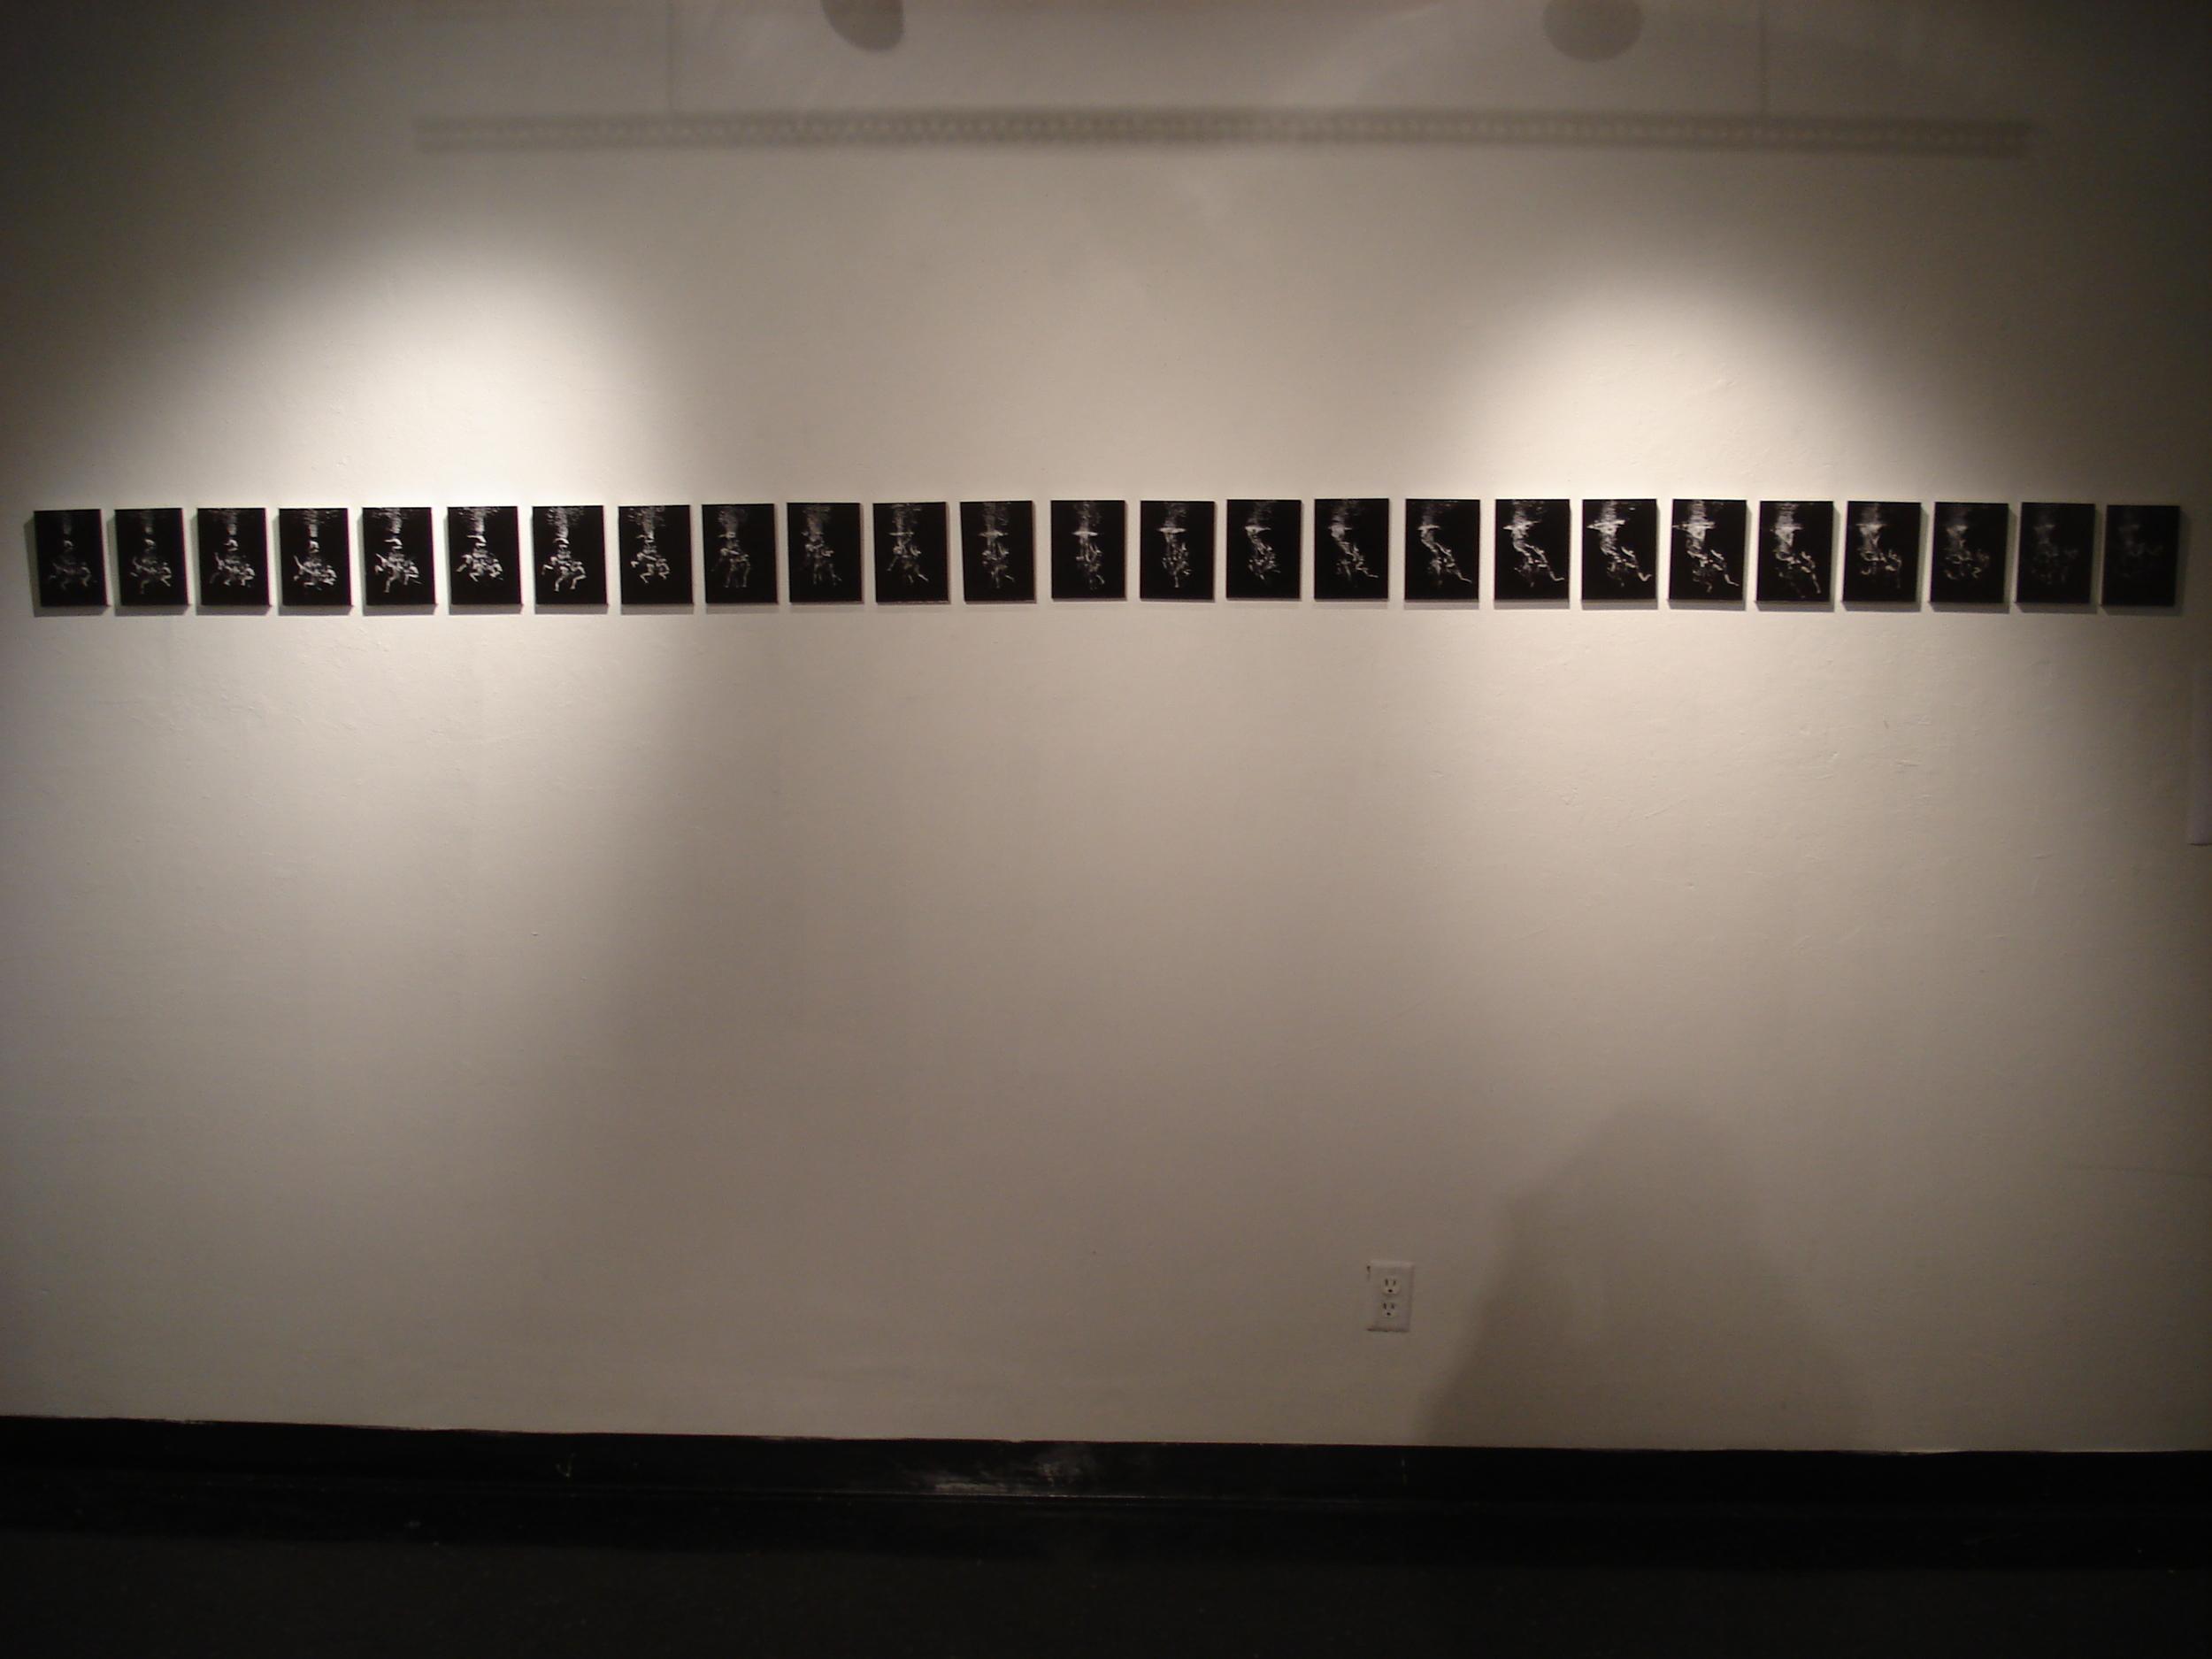 underwater art photograph gallery display